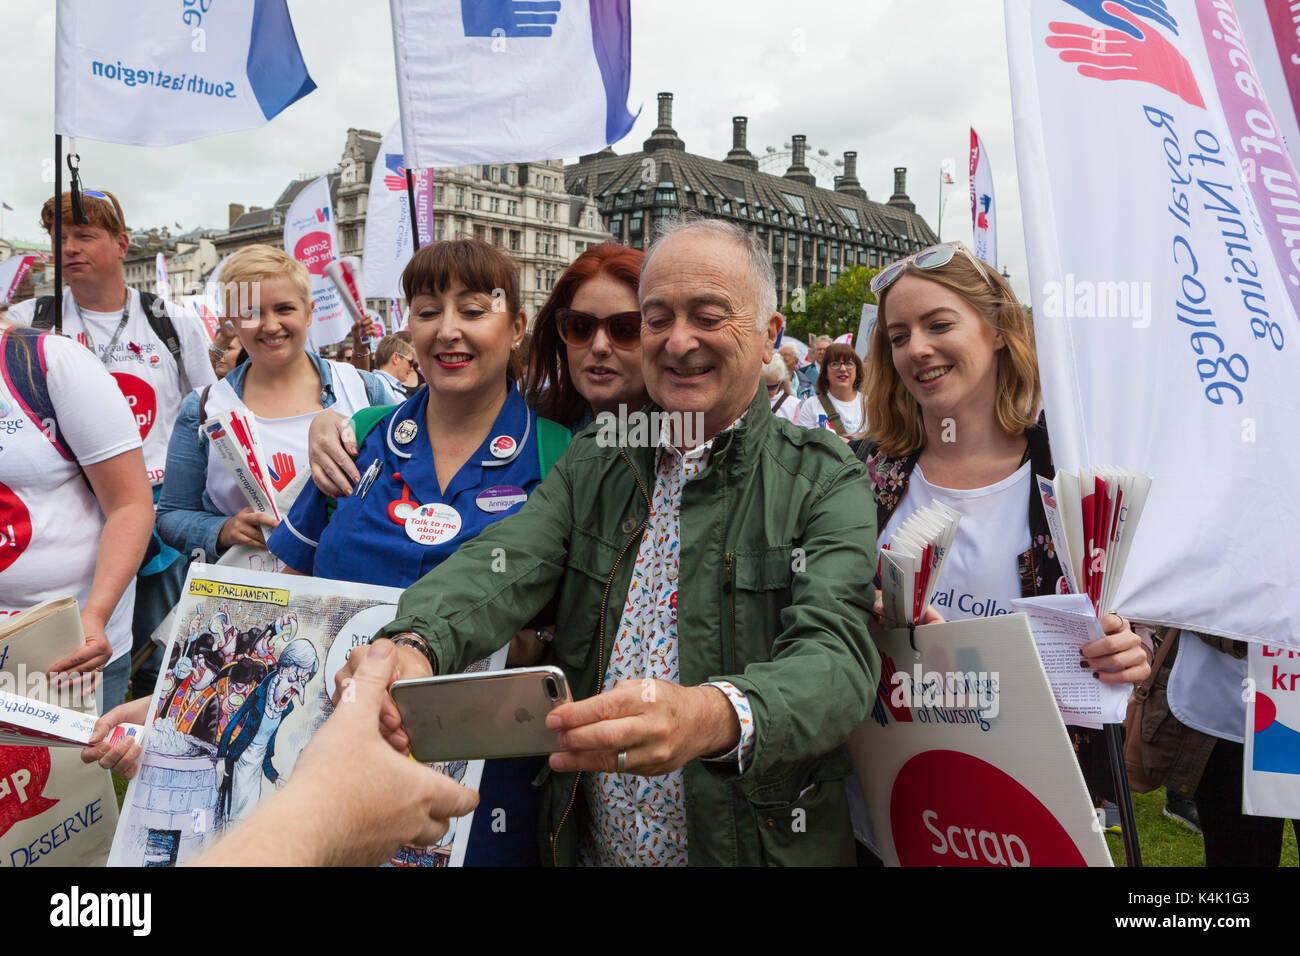 RCN Scrap the Cap Rally: Parliament Square, London UK. 6th September, 2017.  RCN (Royal Collage of Nursing) members - Stock Image